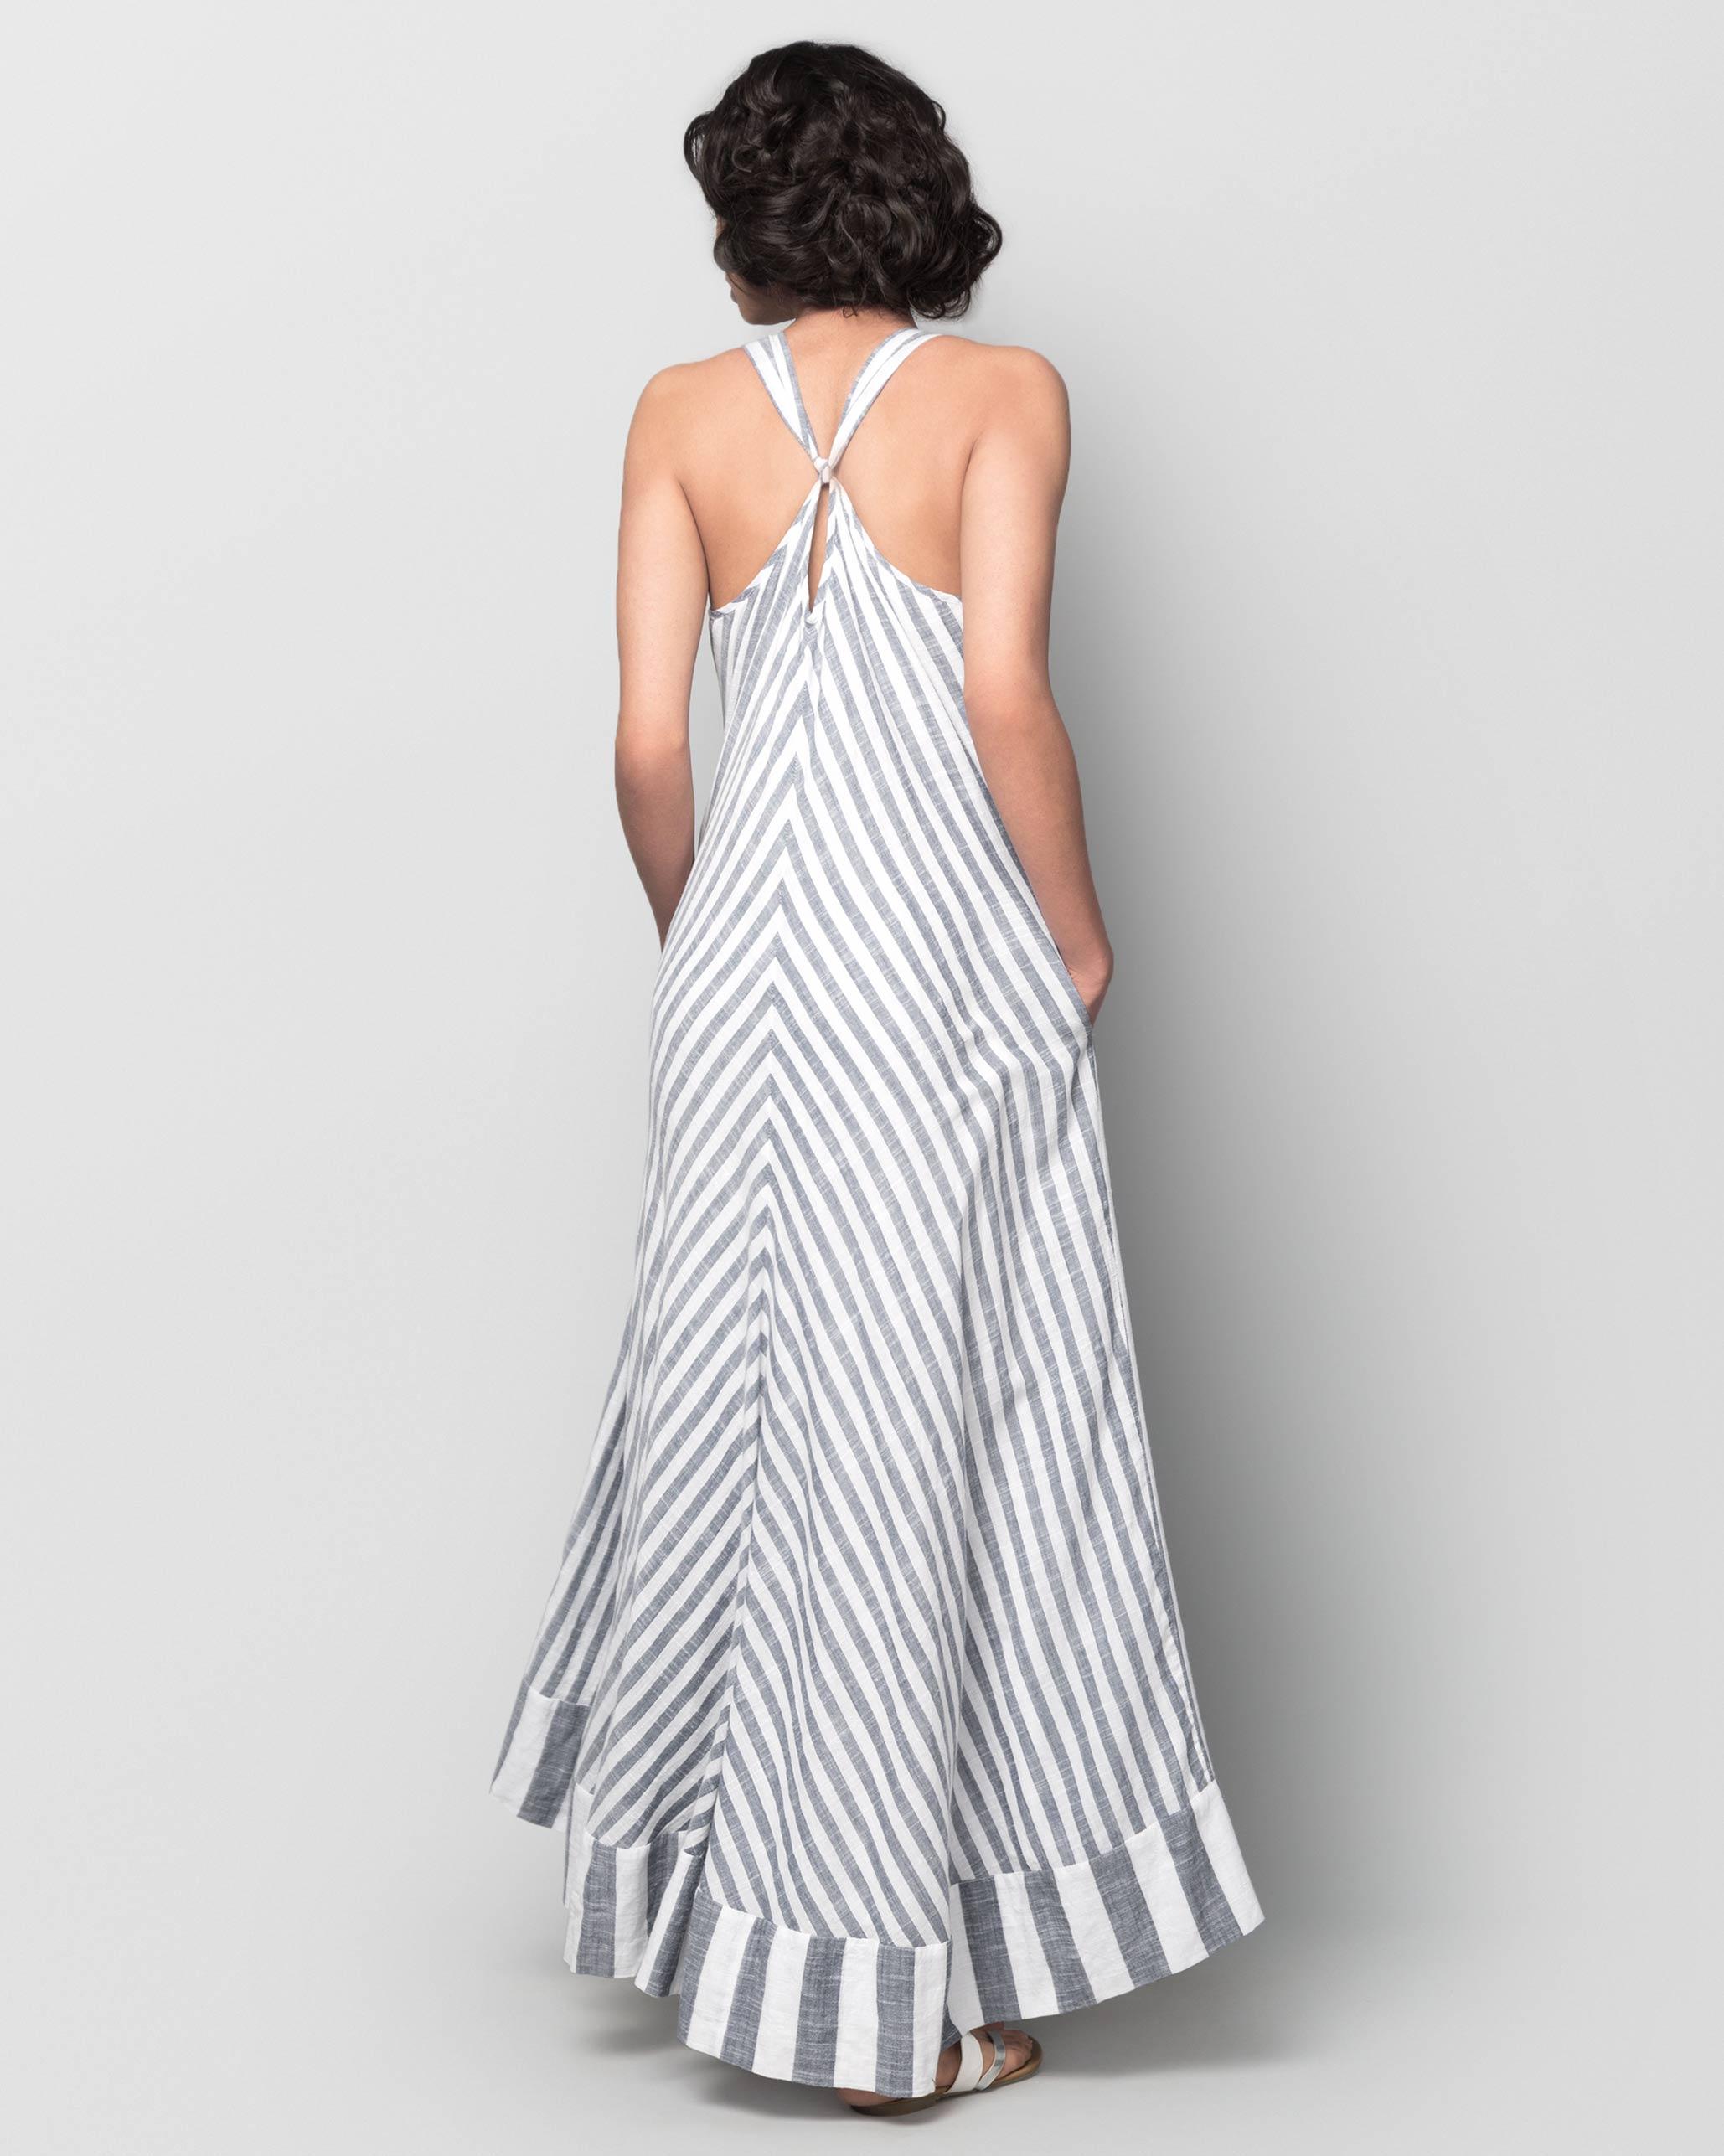 130d35efc0 Buy Akira Twist-back Stripe Dress Women Dresses & Overlays Online ...